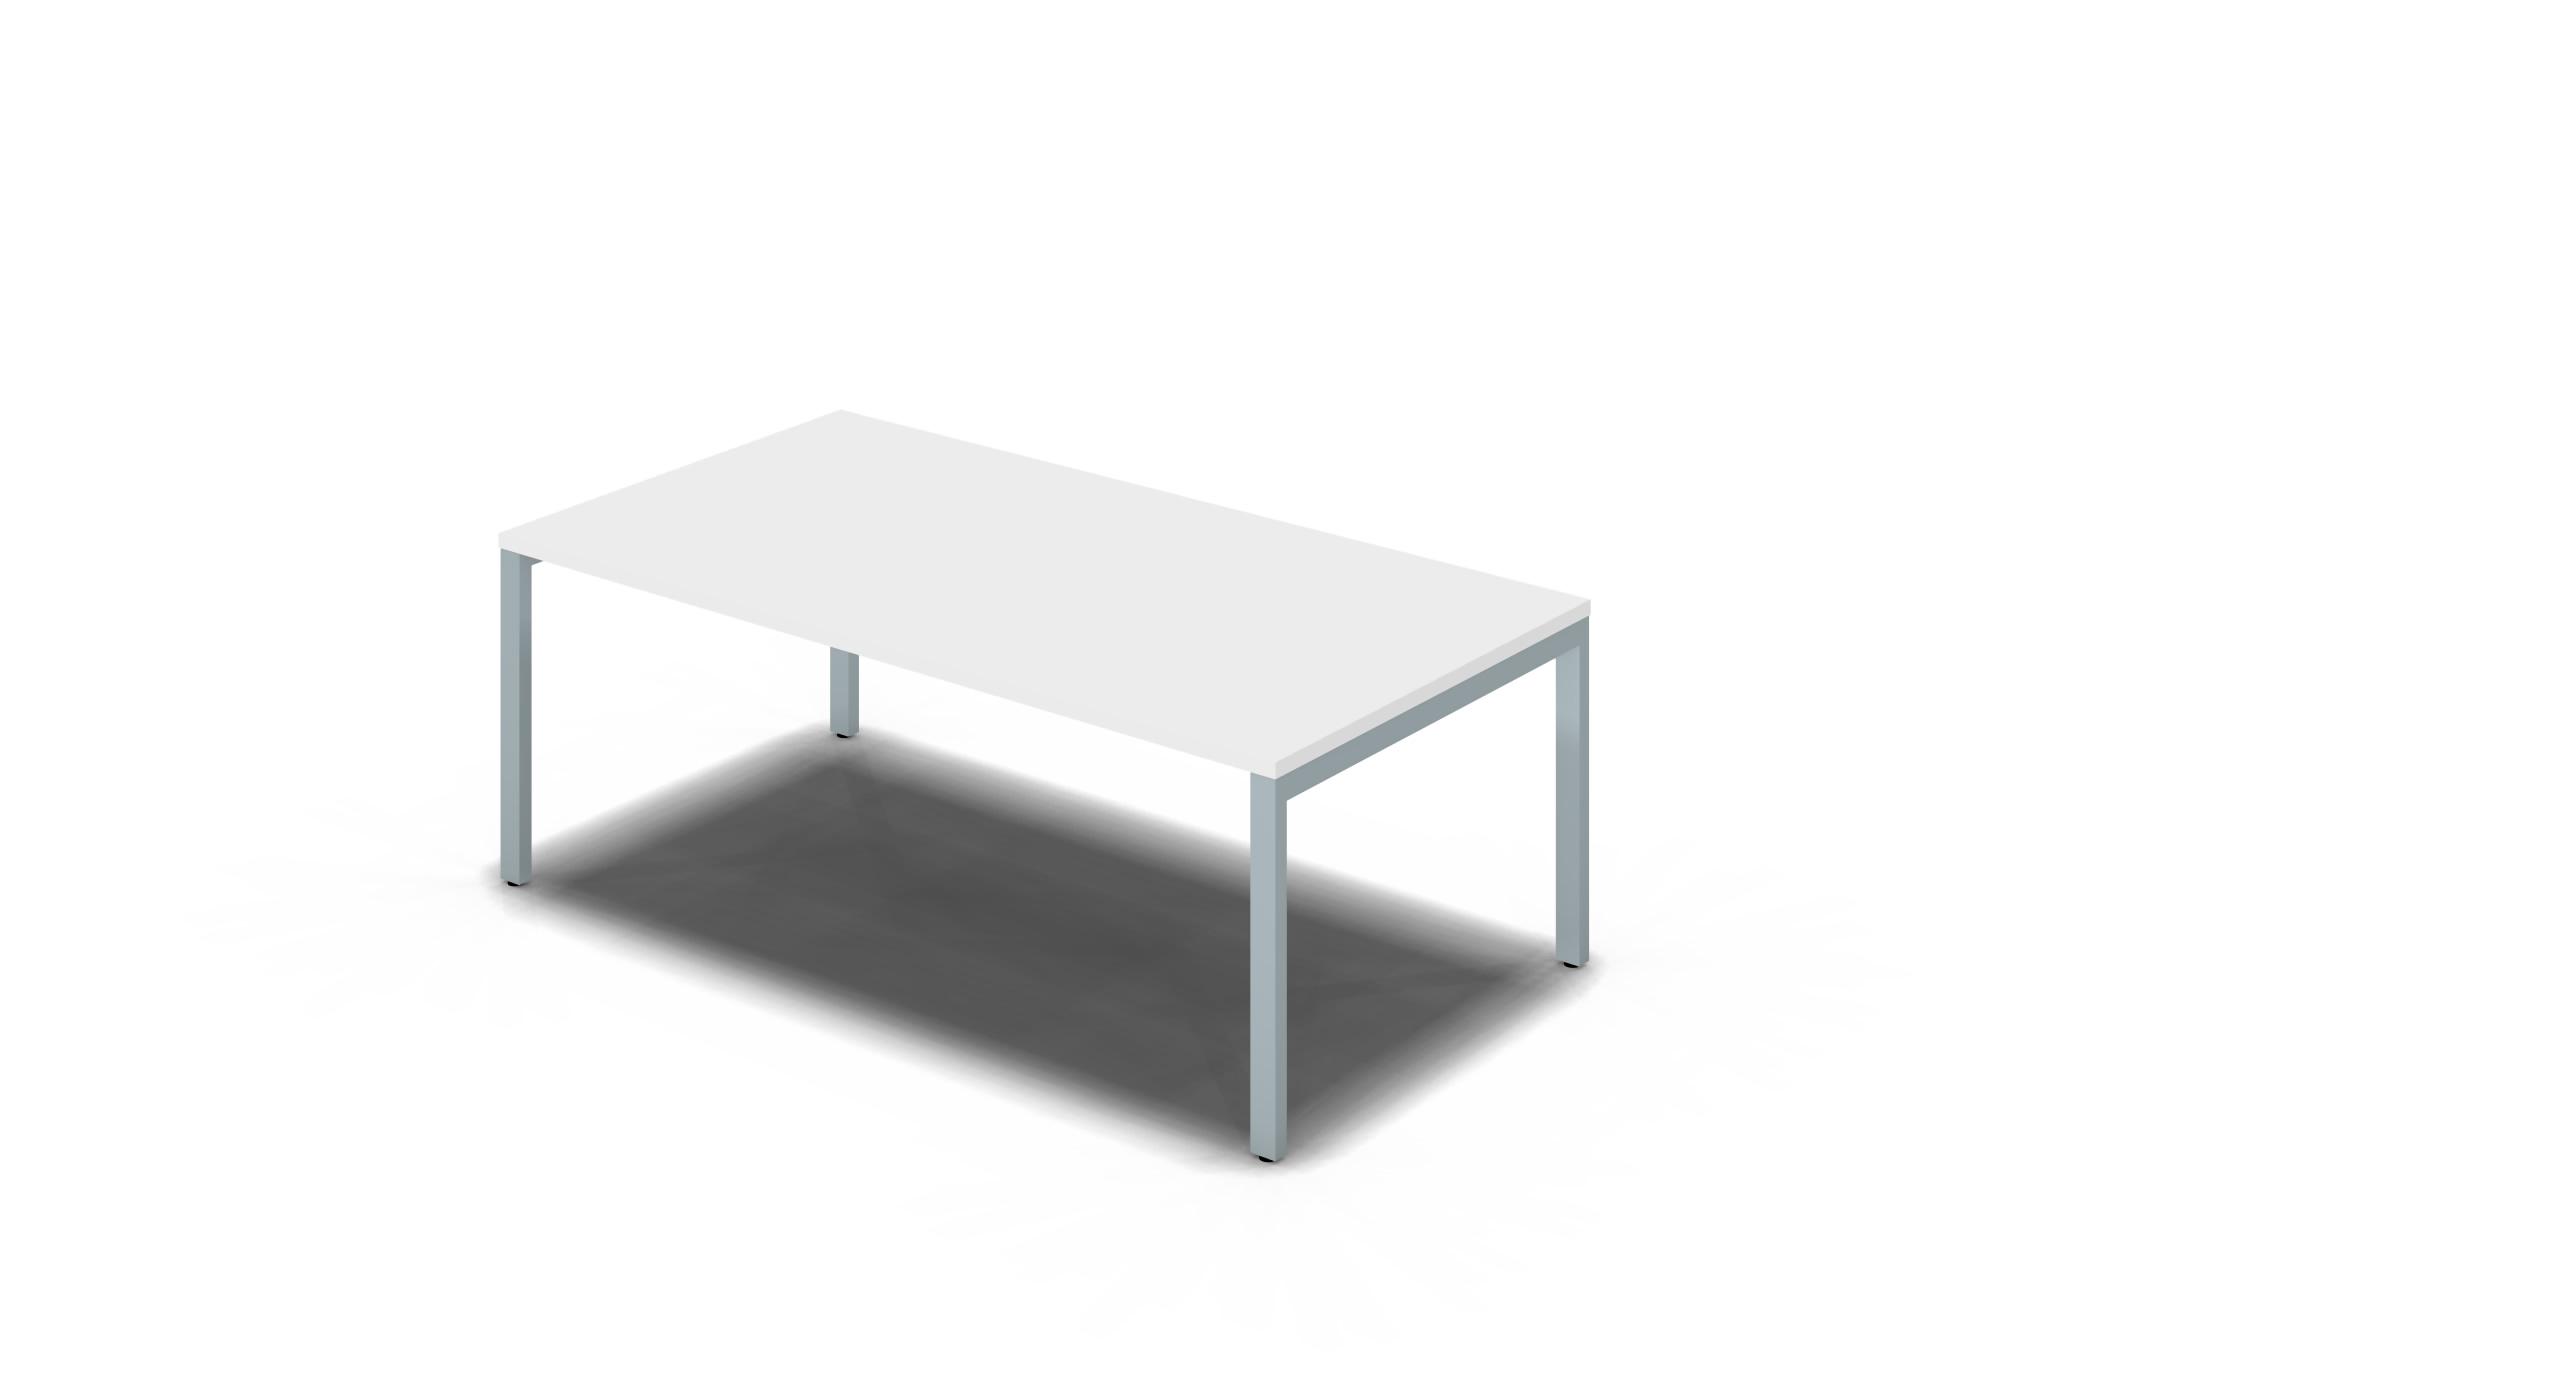 Table_Square_1800x900_Silver_White_noOption